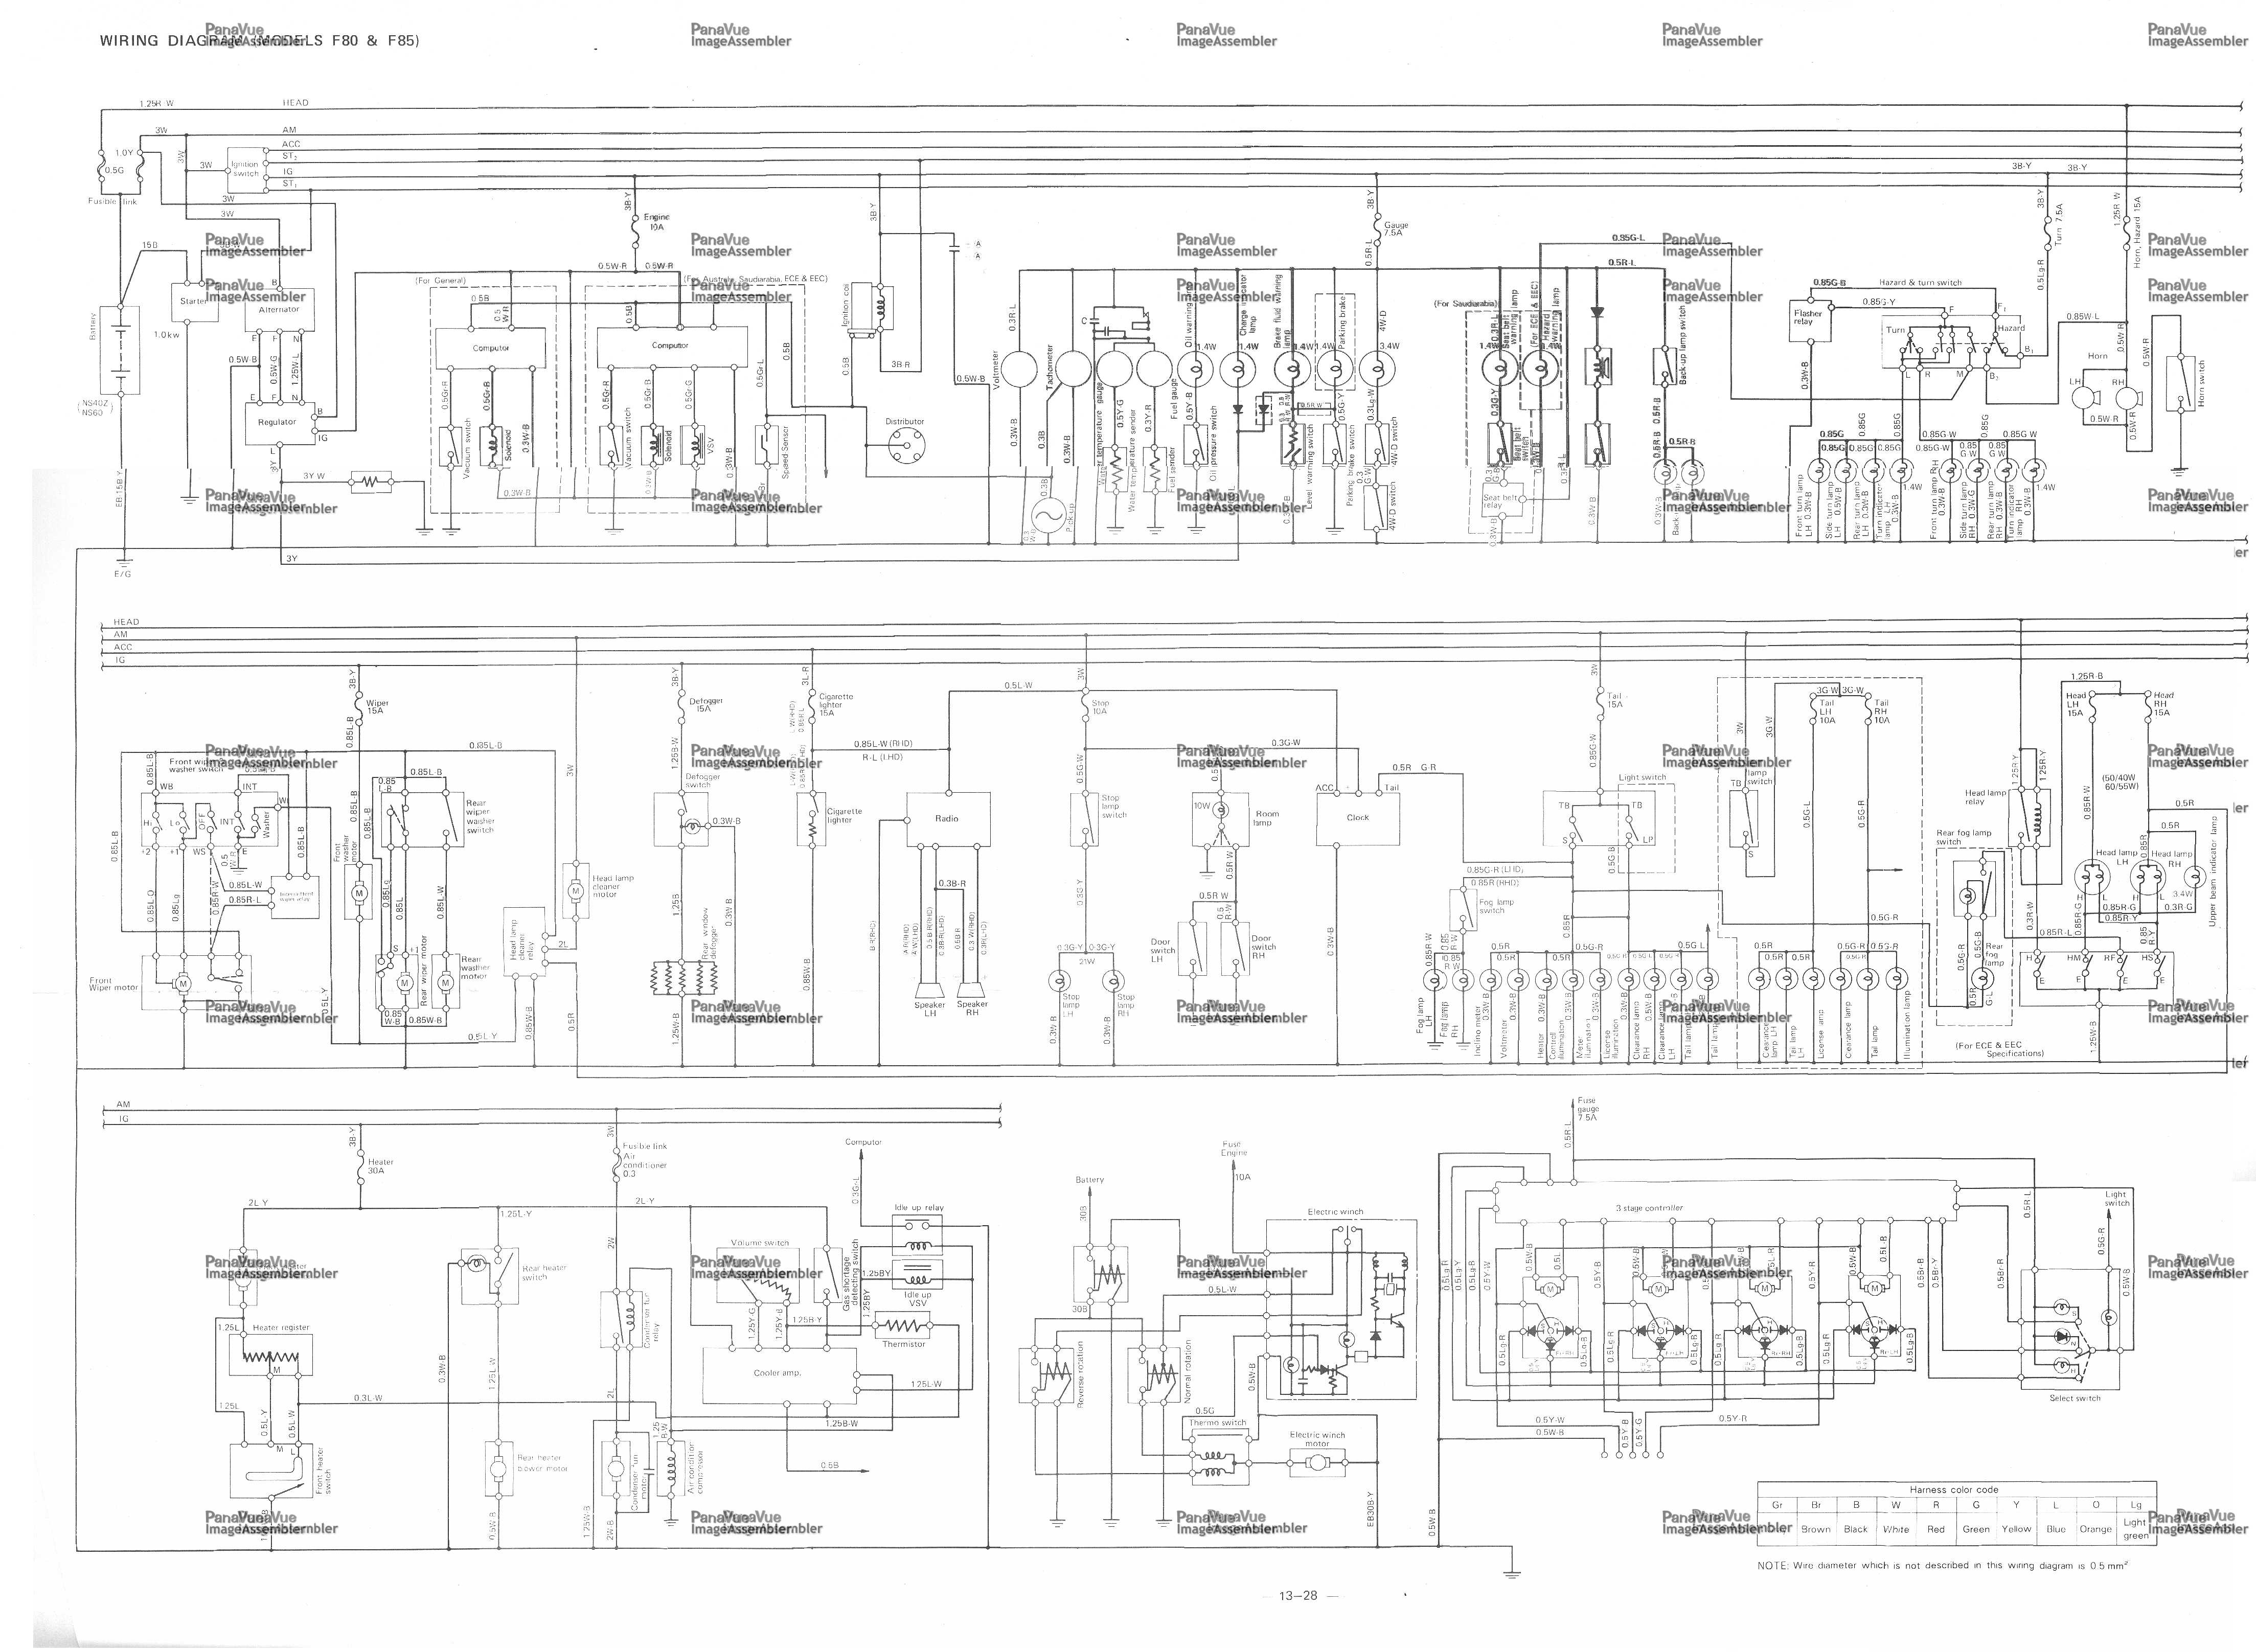 Daihatsu Alternator Wiring Diagram : Reznor f wiring diagram images